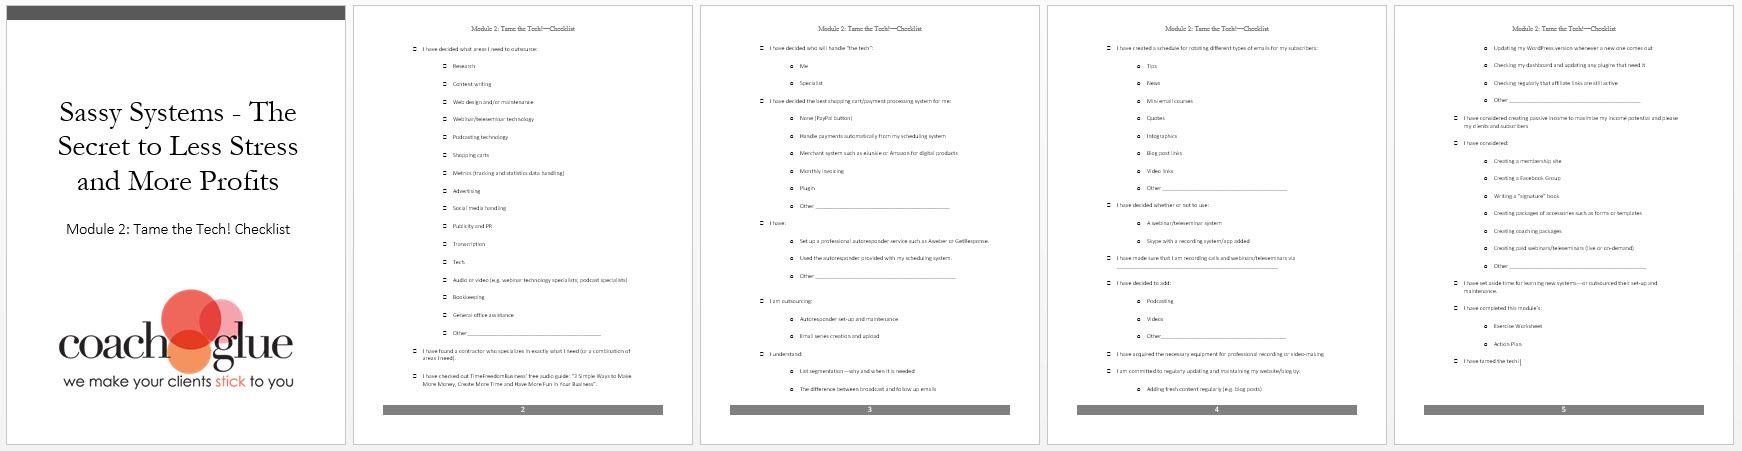 Module 2 Tame the Tech Checklist Screenshot